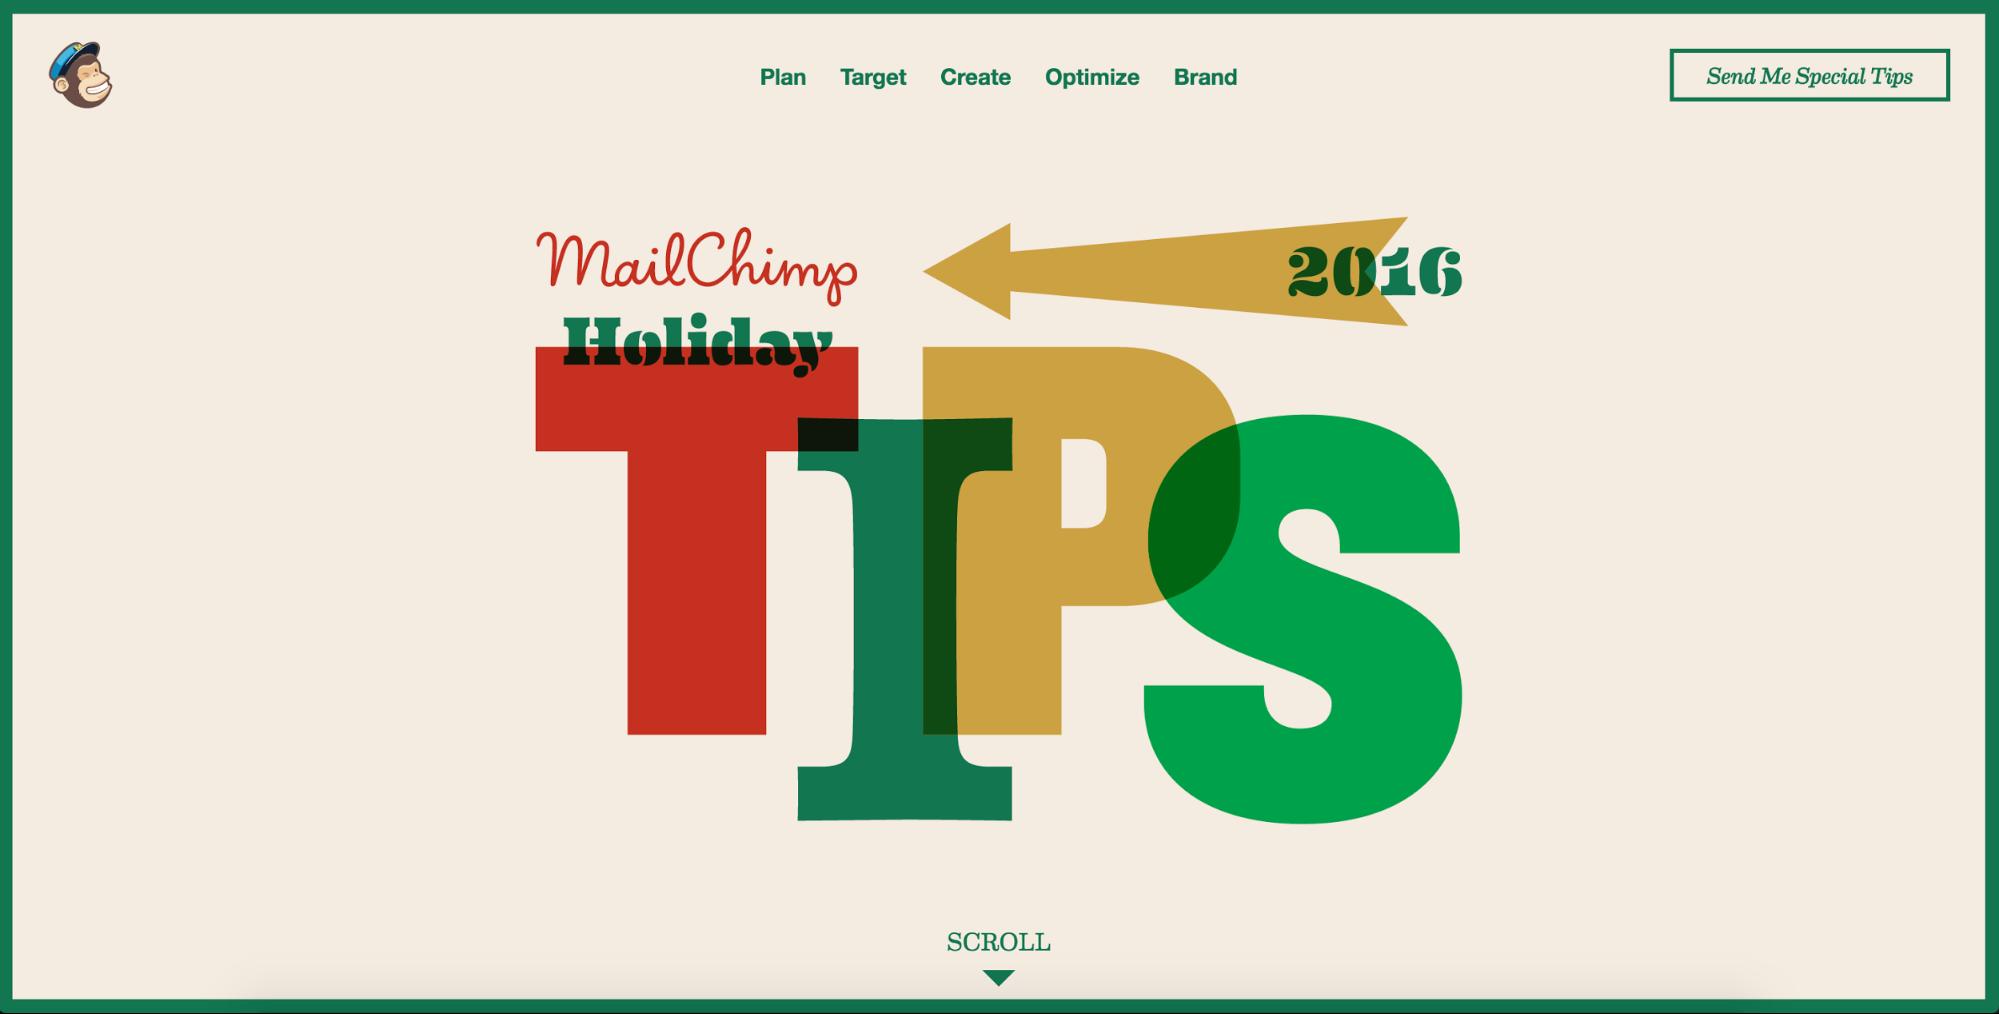 MailChimp holiday marketing tips